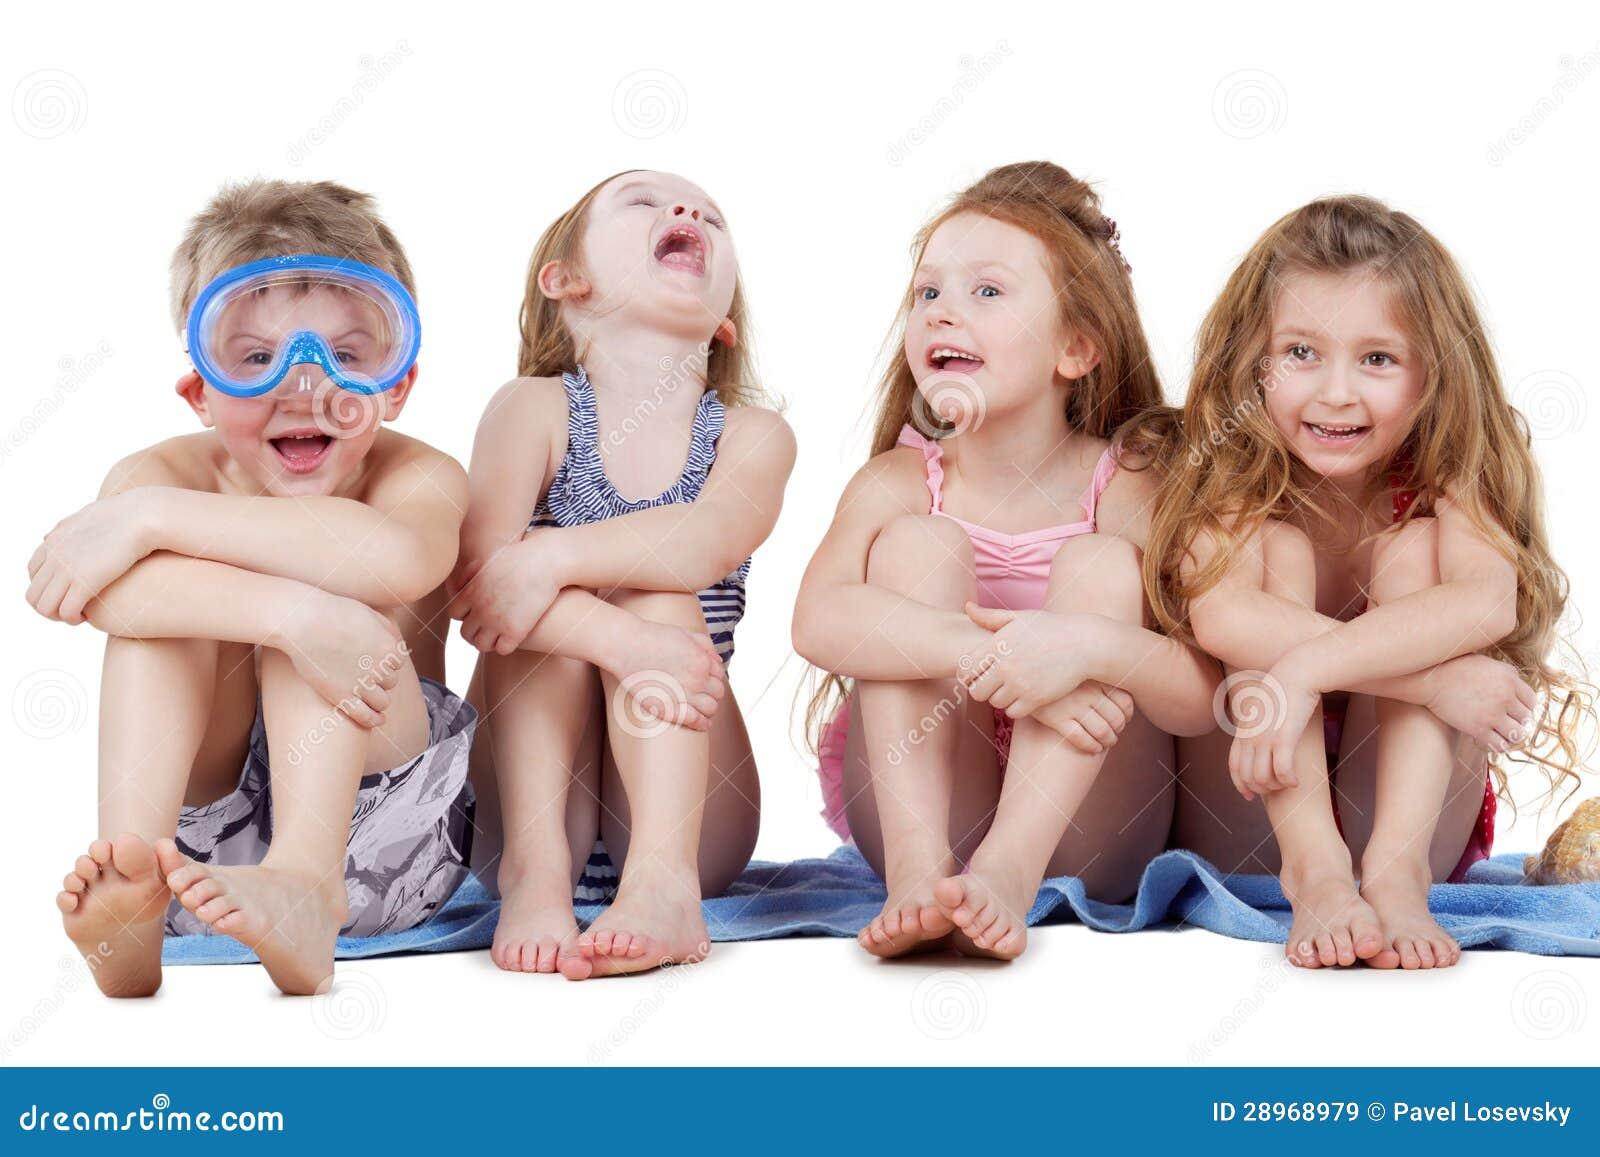 Трое девушек и парень фото фото 146-20